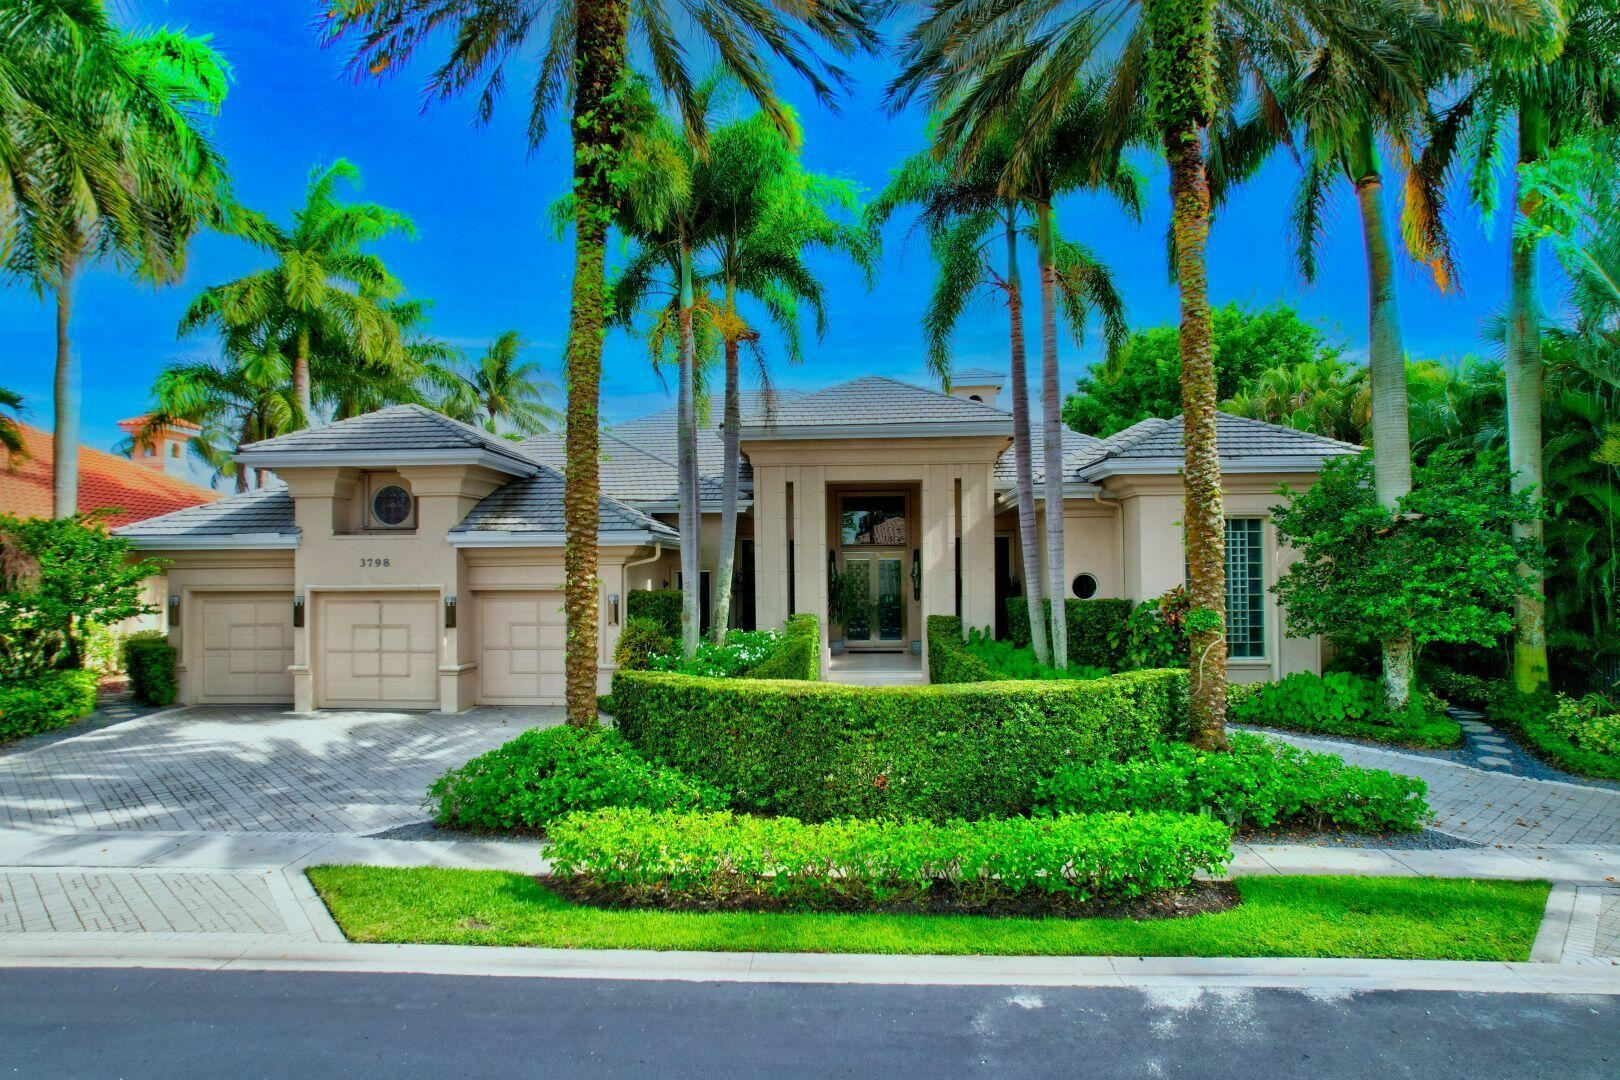 3798 NW Coventry Lane, Boca Raton, FL 33496 - MLS#: RX-10731329